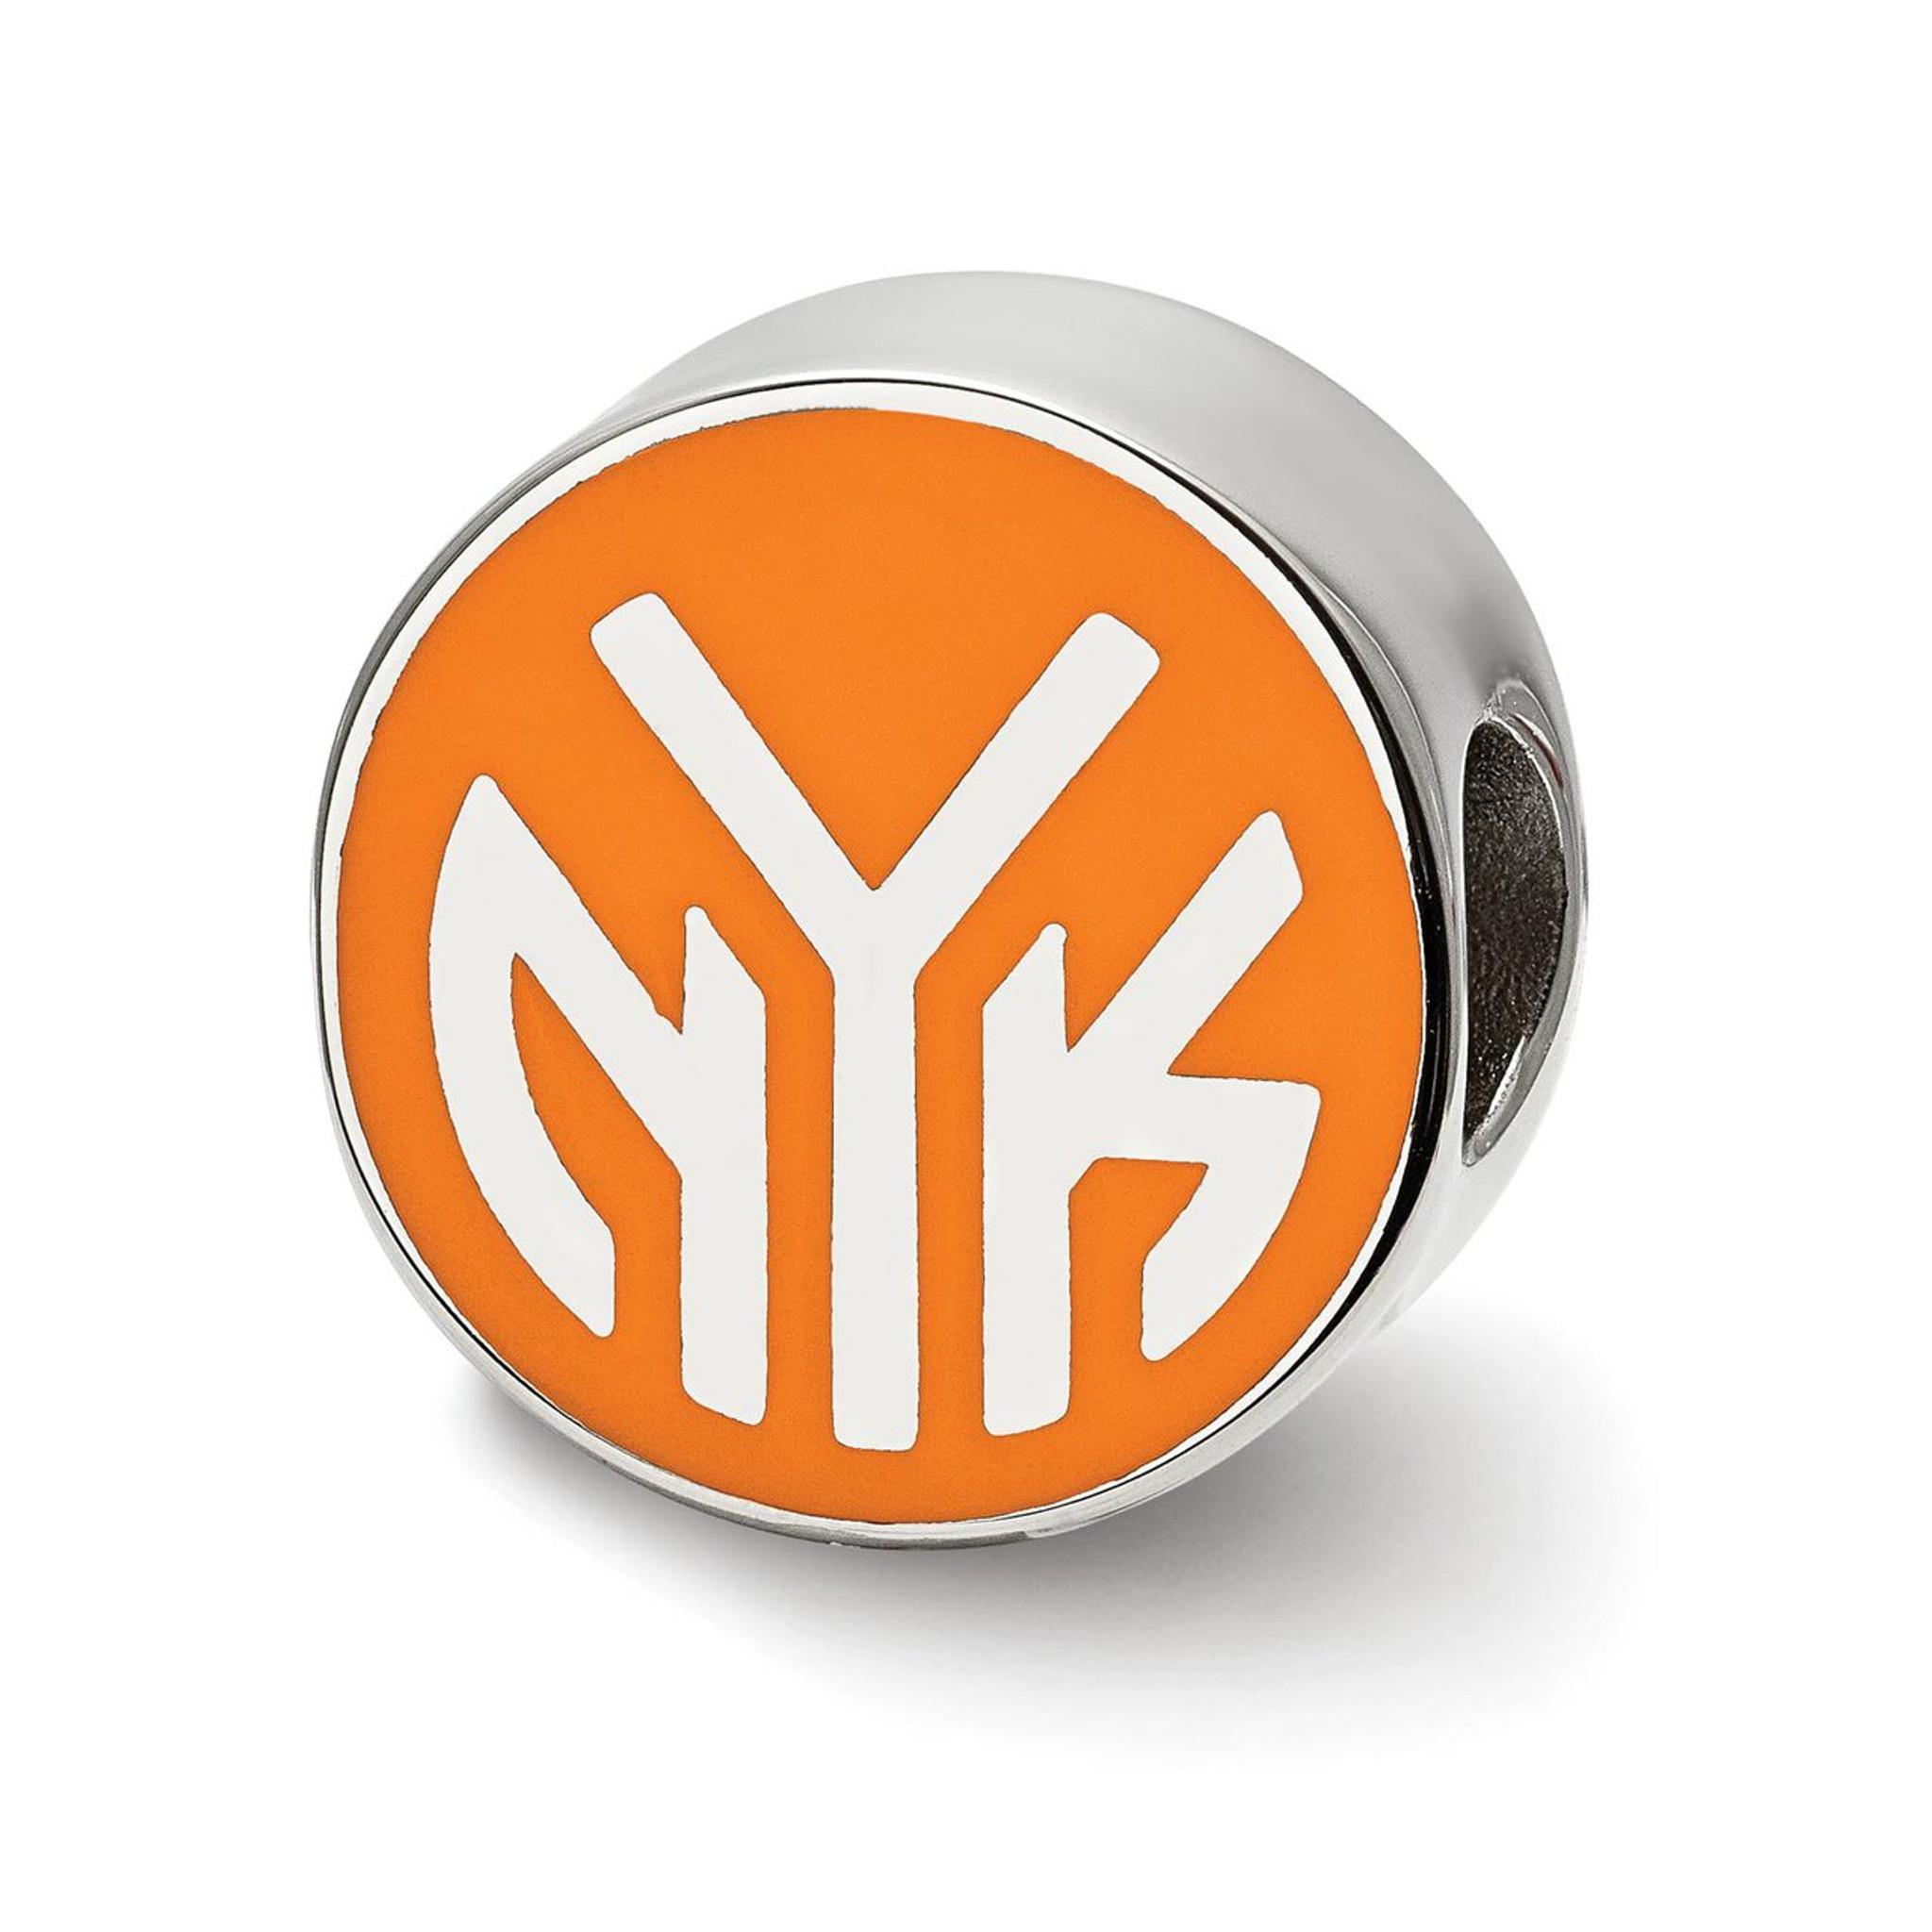 Nba Basketball New York Knicks: New York Knicks Knicks In Basketball Enameled Logo Bead